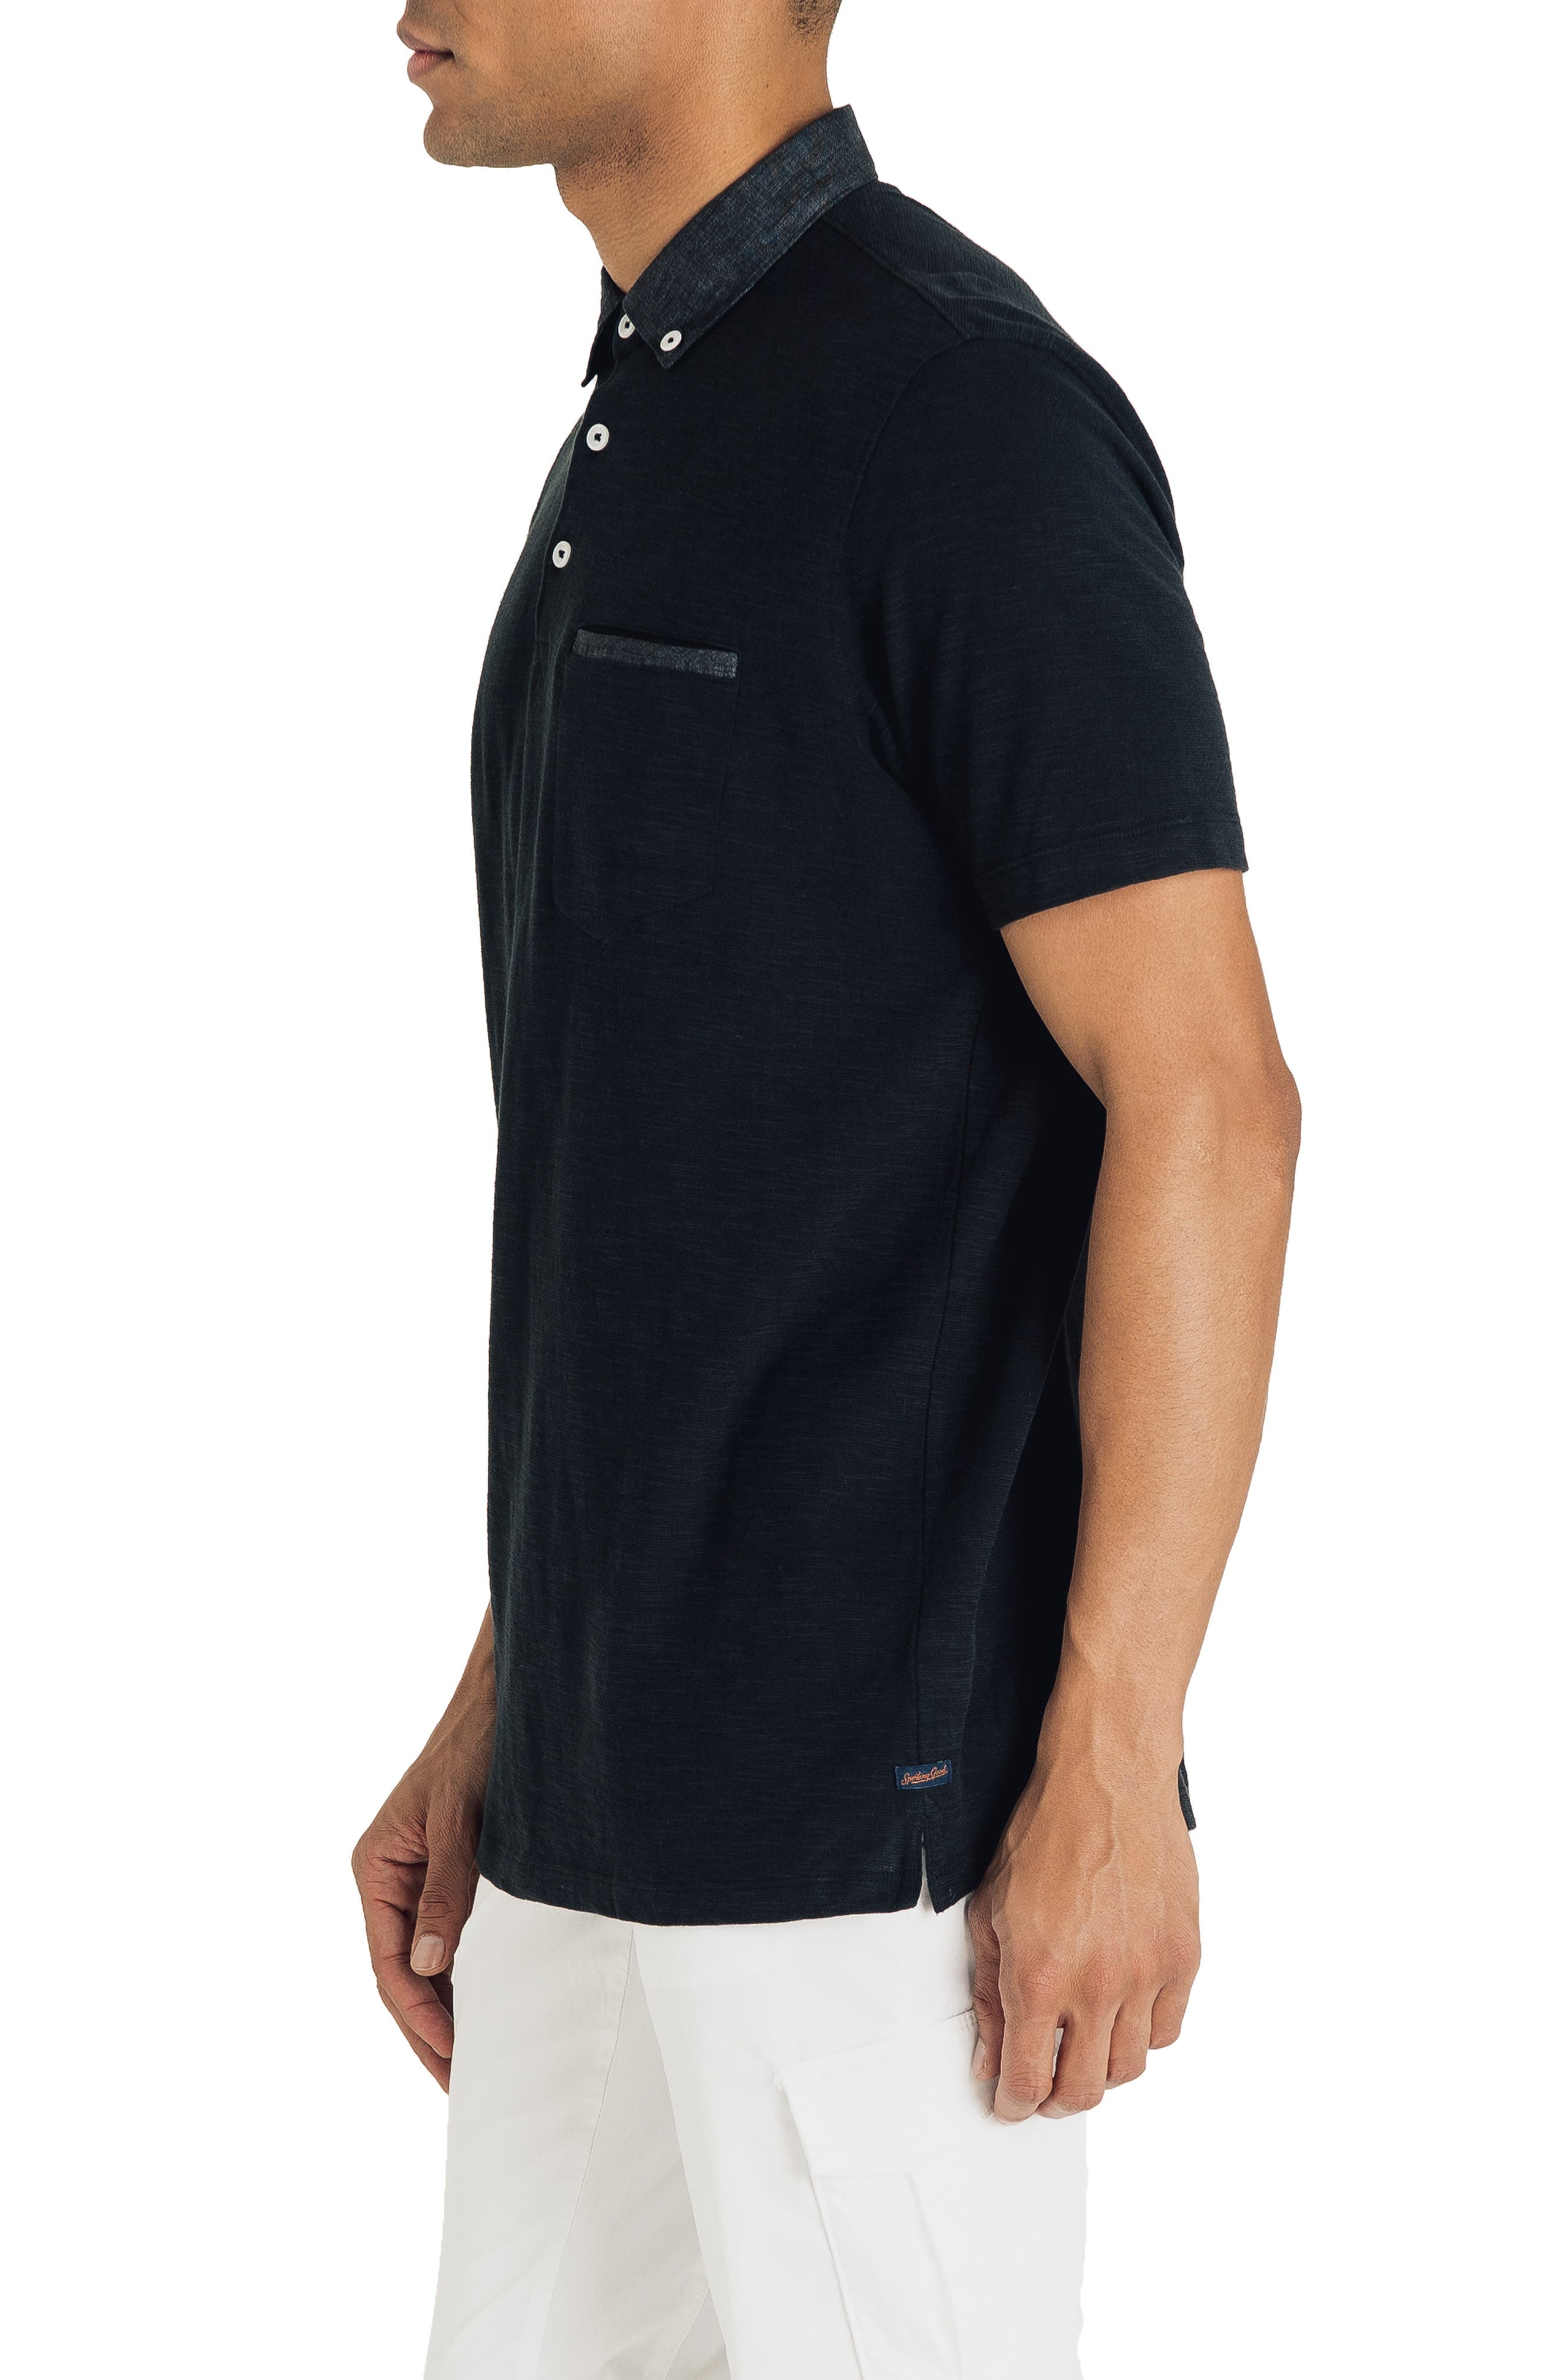 GOOD MAN BRAND, Slub Jersey Cotton Polo Shirt, Alternate thumbnail 3, color, BLACK